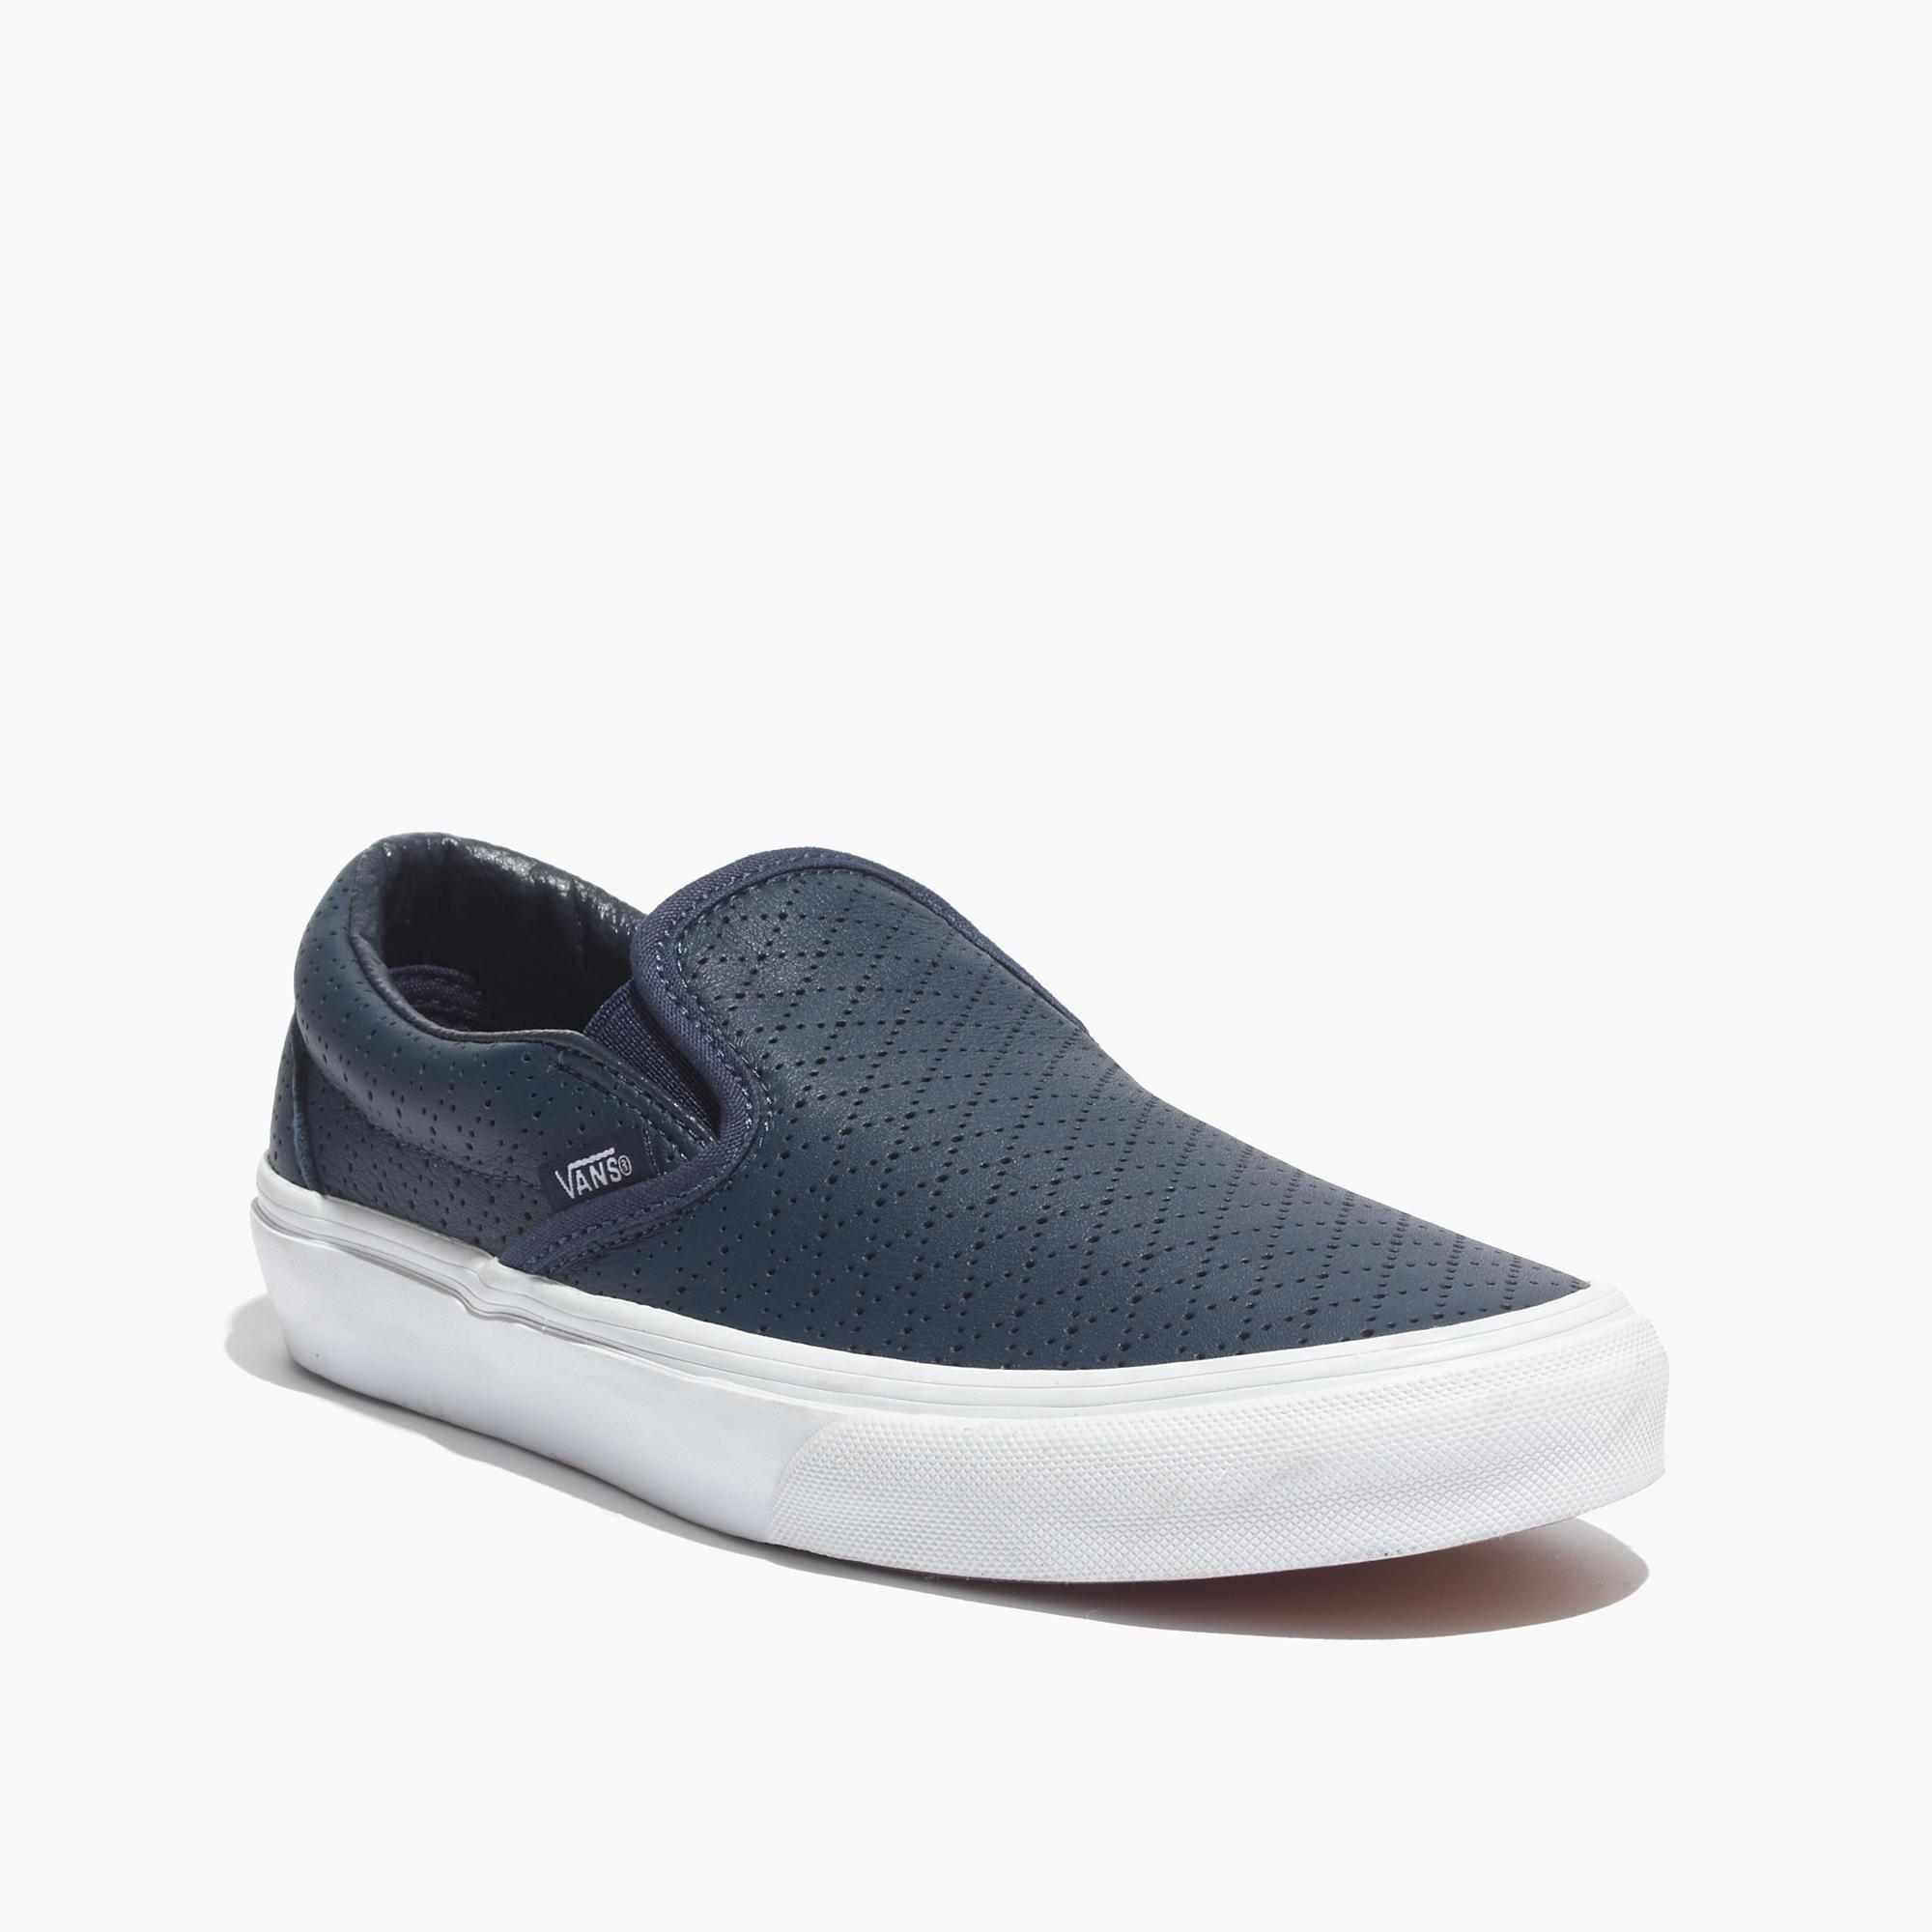 Vans Classic SlipOn Sneakers in Diamond Perforated Leather sneakers Madewell